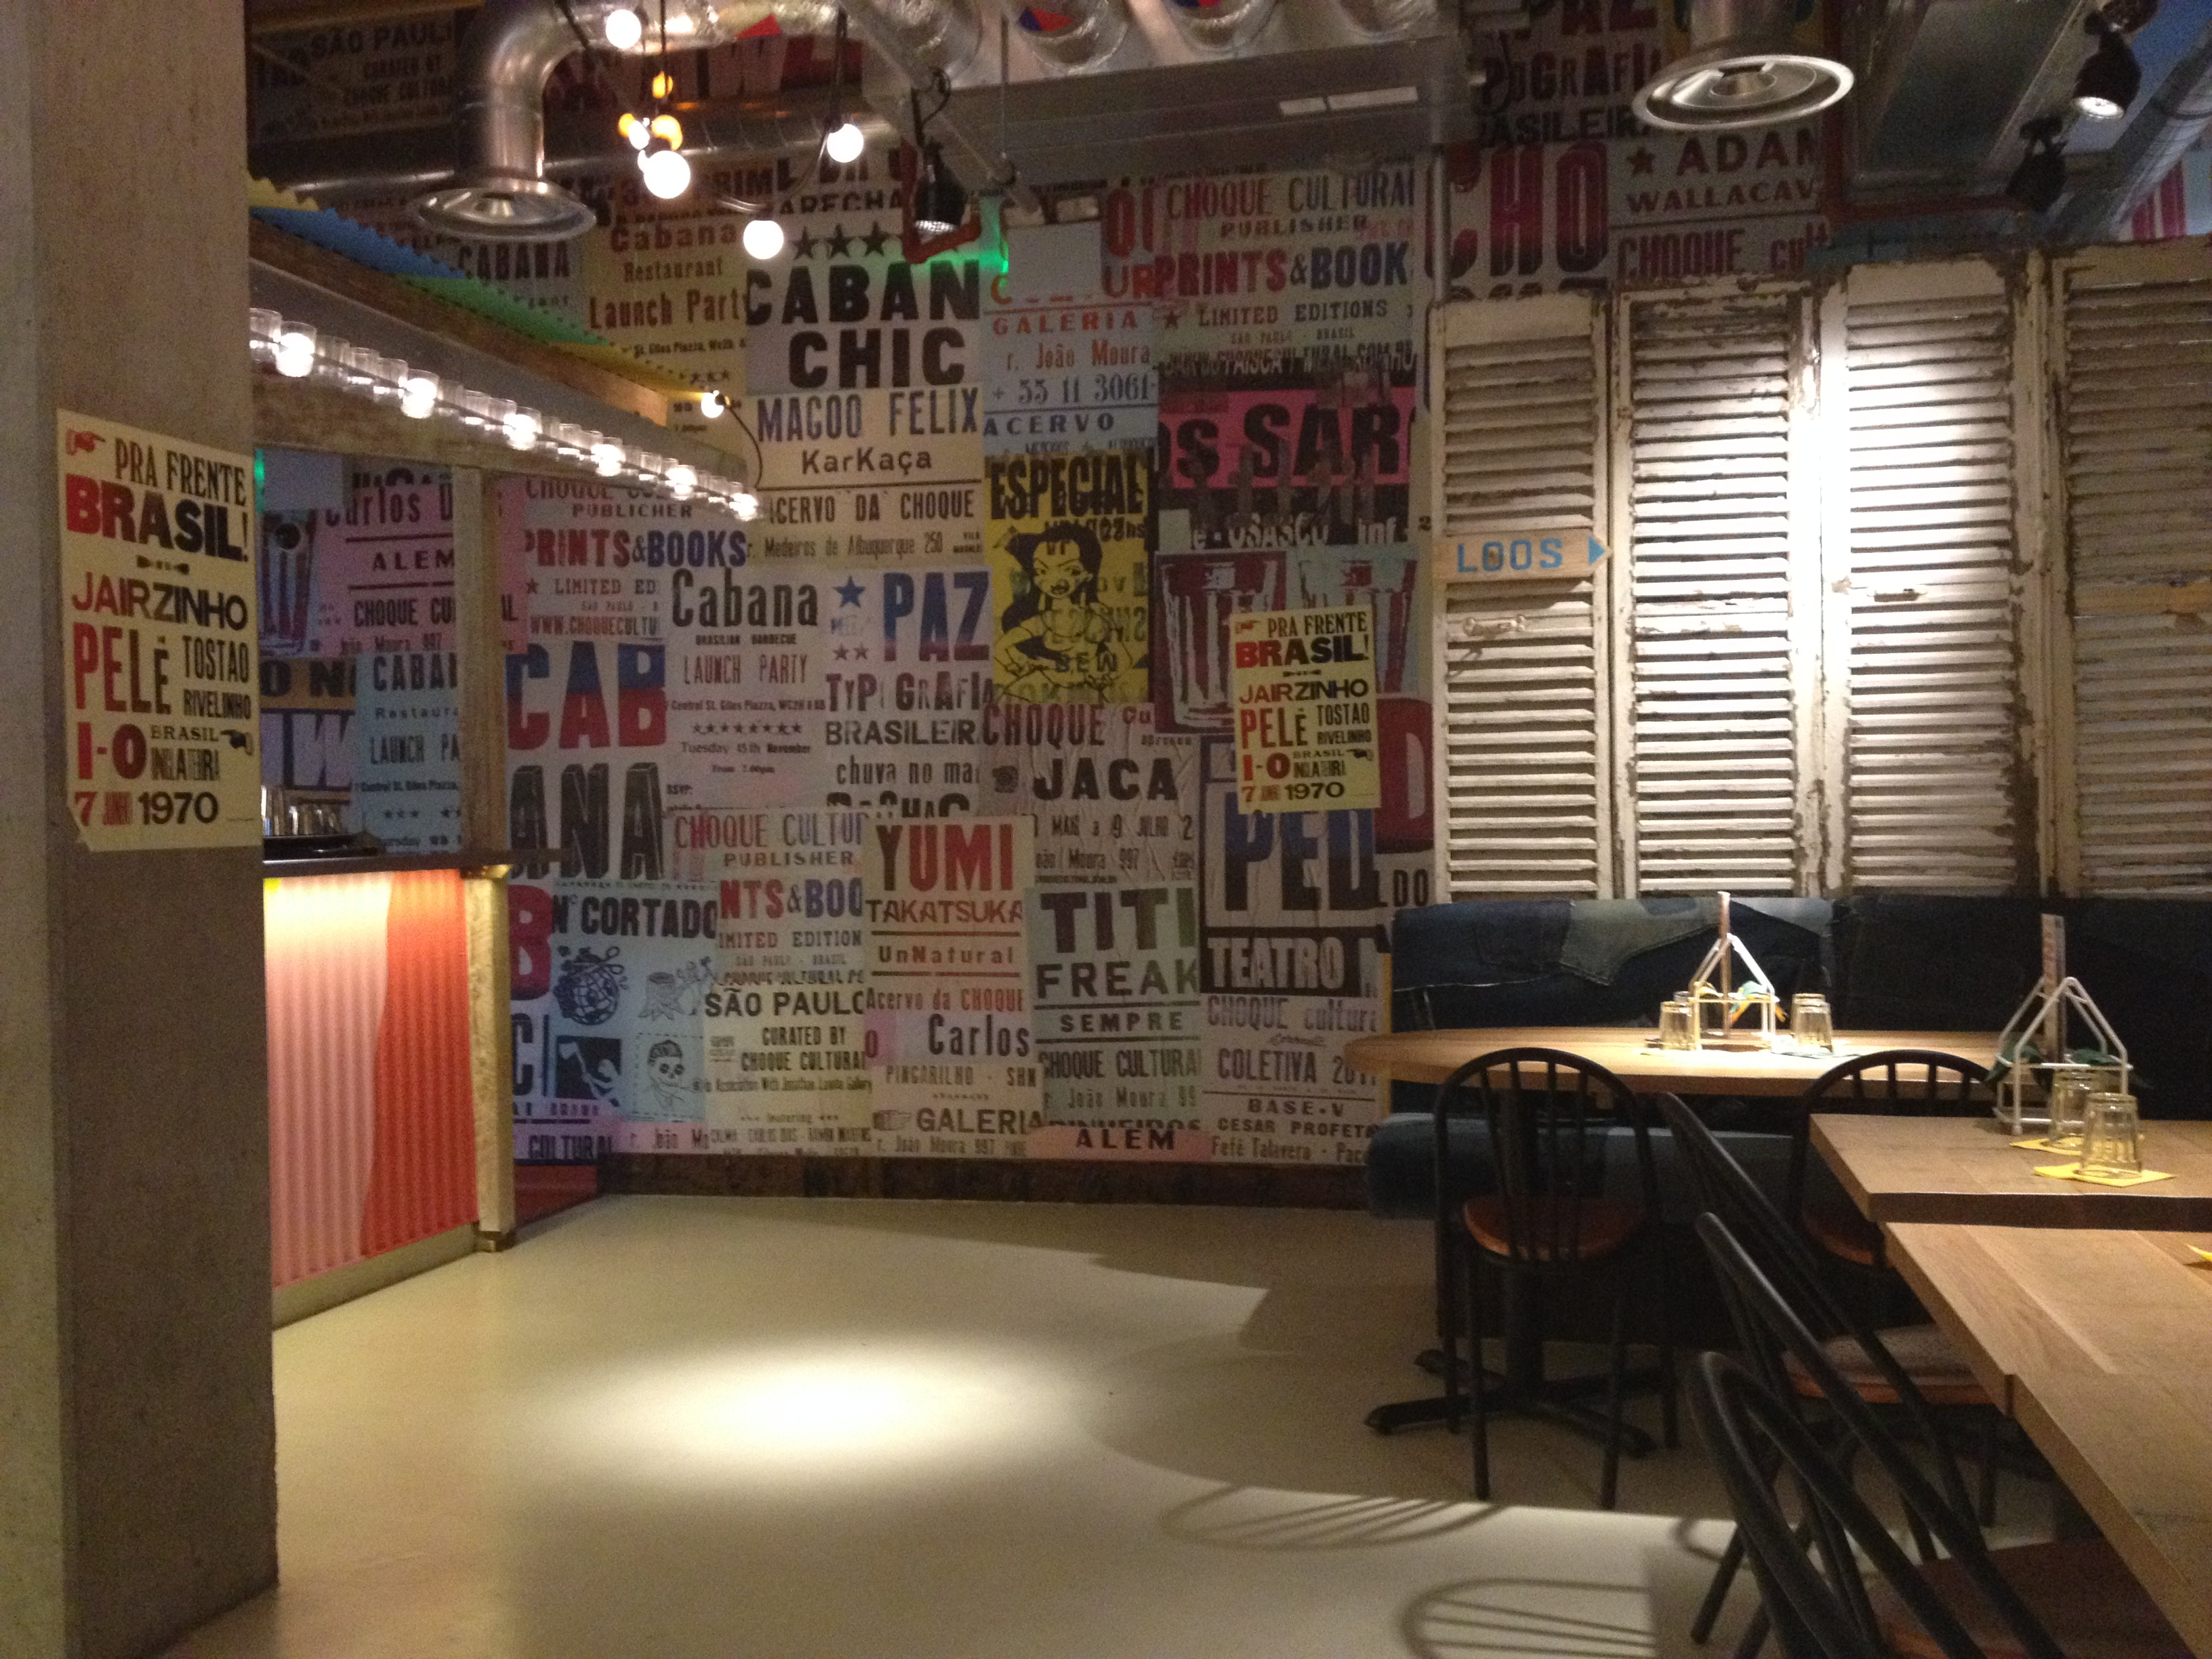 Cabana brazilian barbecue restaurant review wembley